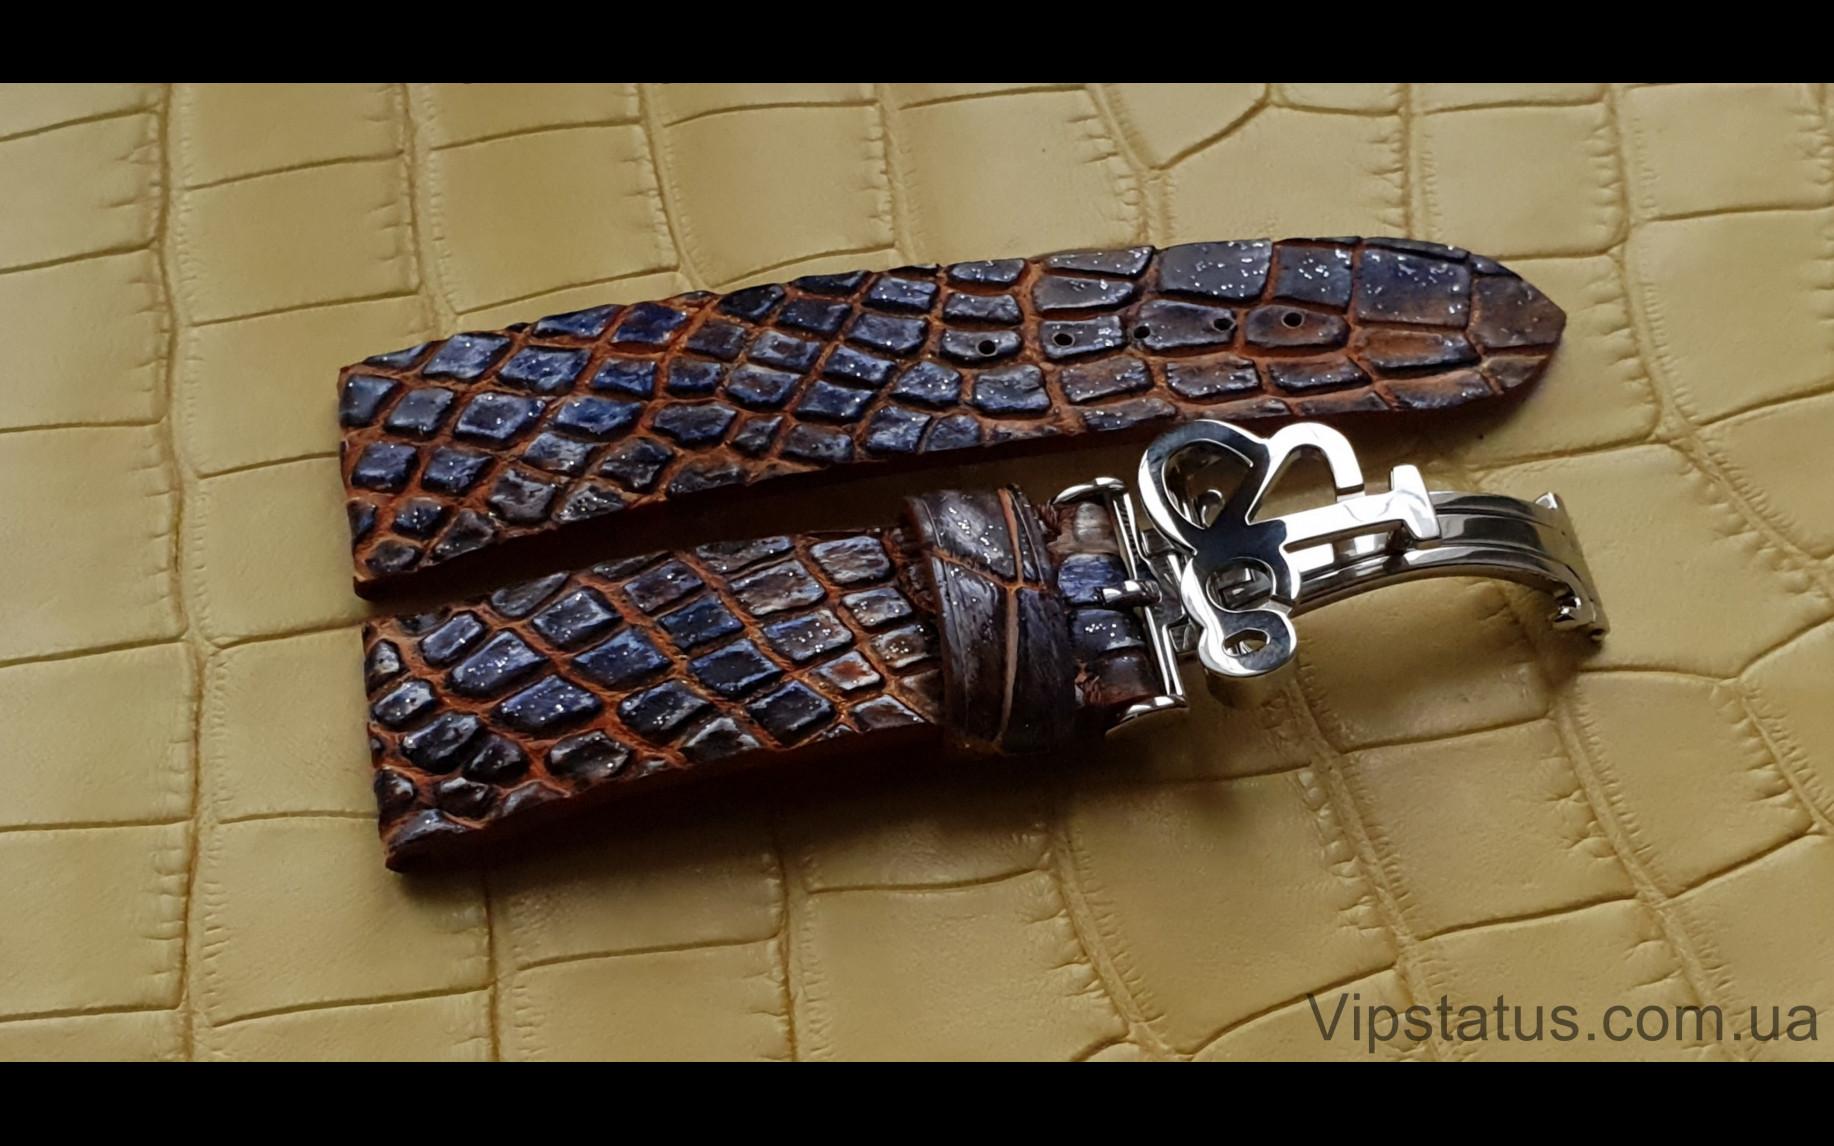 Elite Премиум ремешок для часов Jacob&Co кожа крокодила Premium Crocodile Strap for Jacob&Co watches image 2